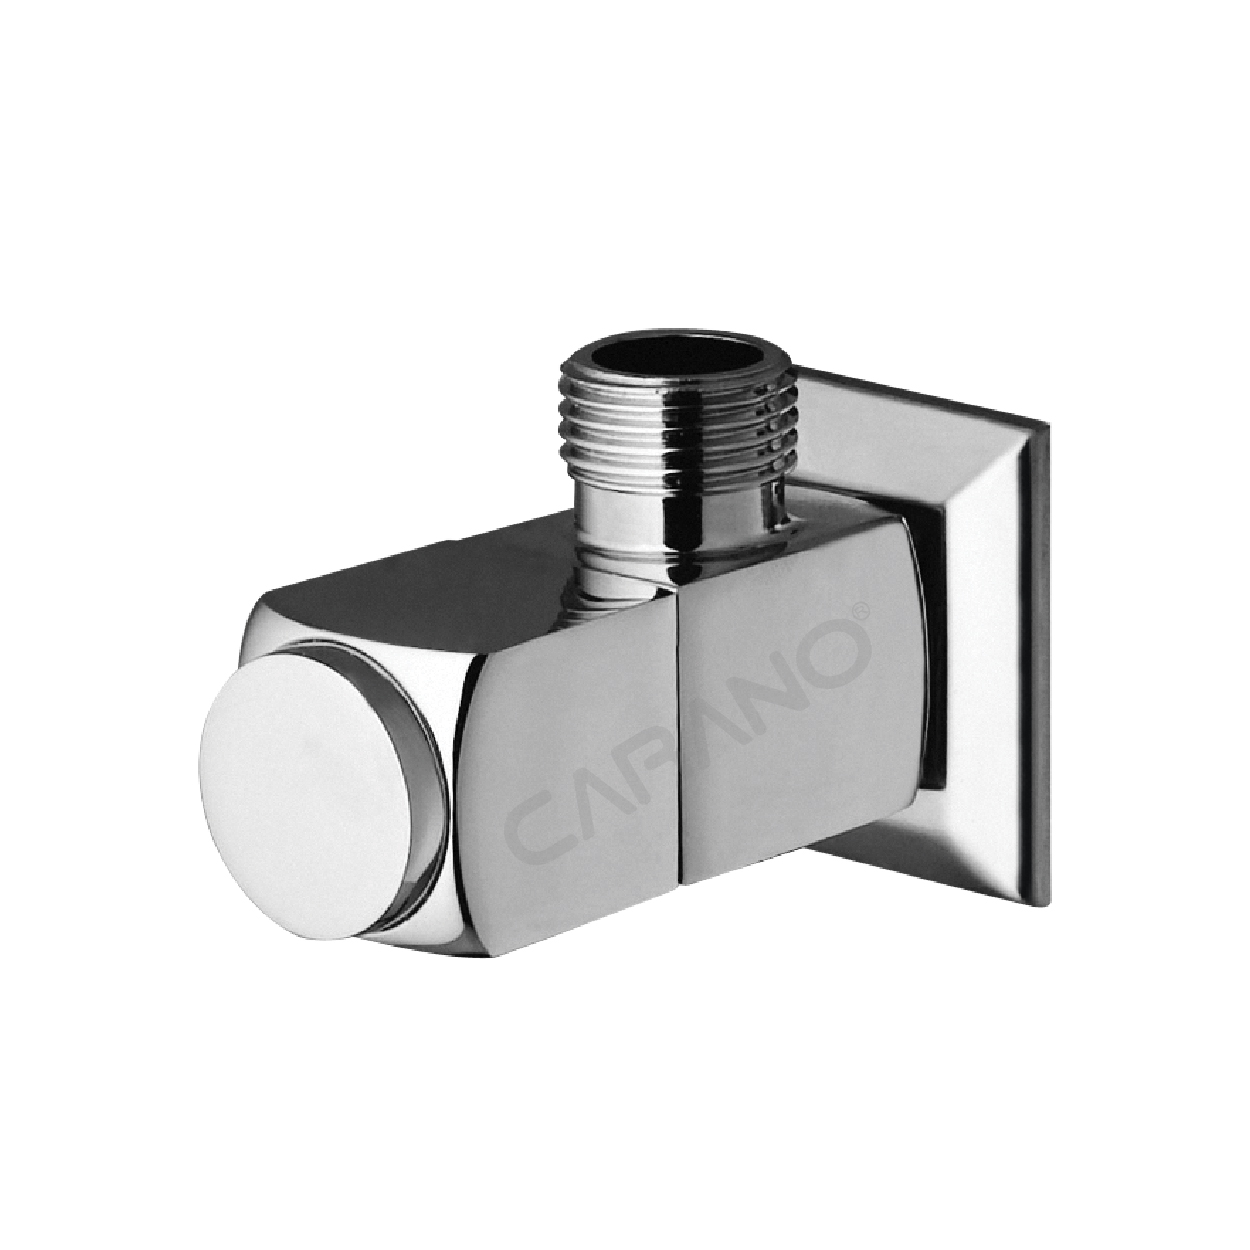 VAN KHÓA NƯỚC CARANO A6100 (van khóa nước model:A6100)